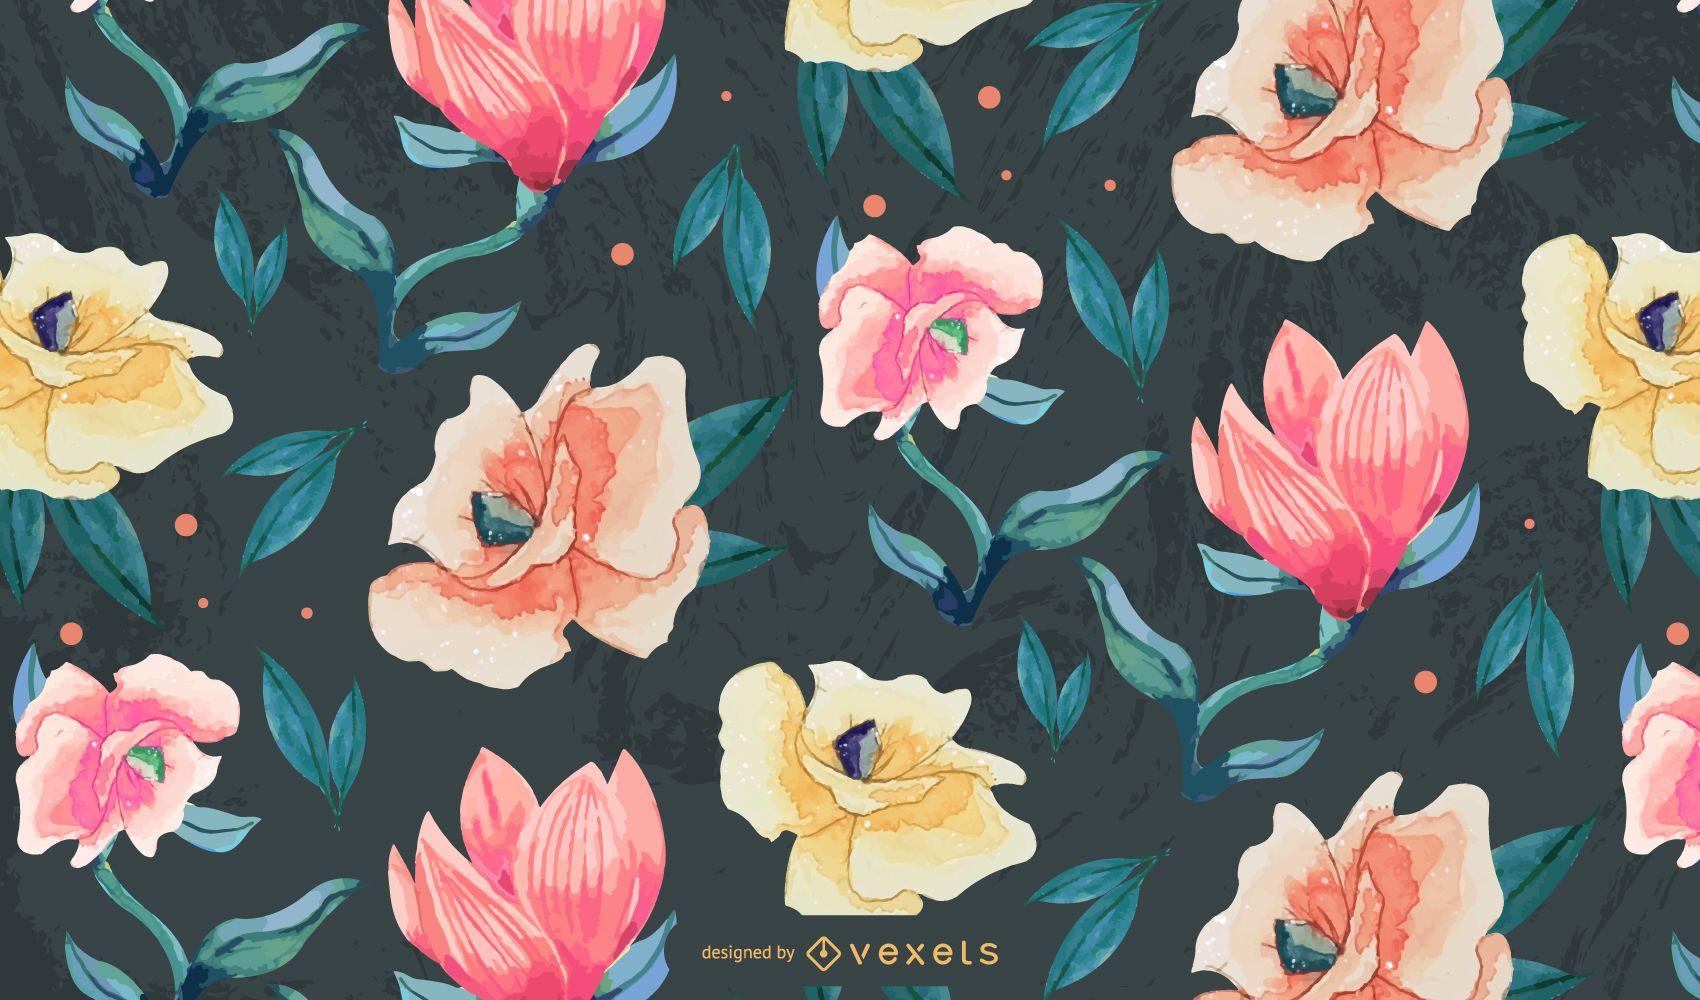 Flowers watercolor pattern design